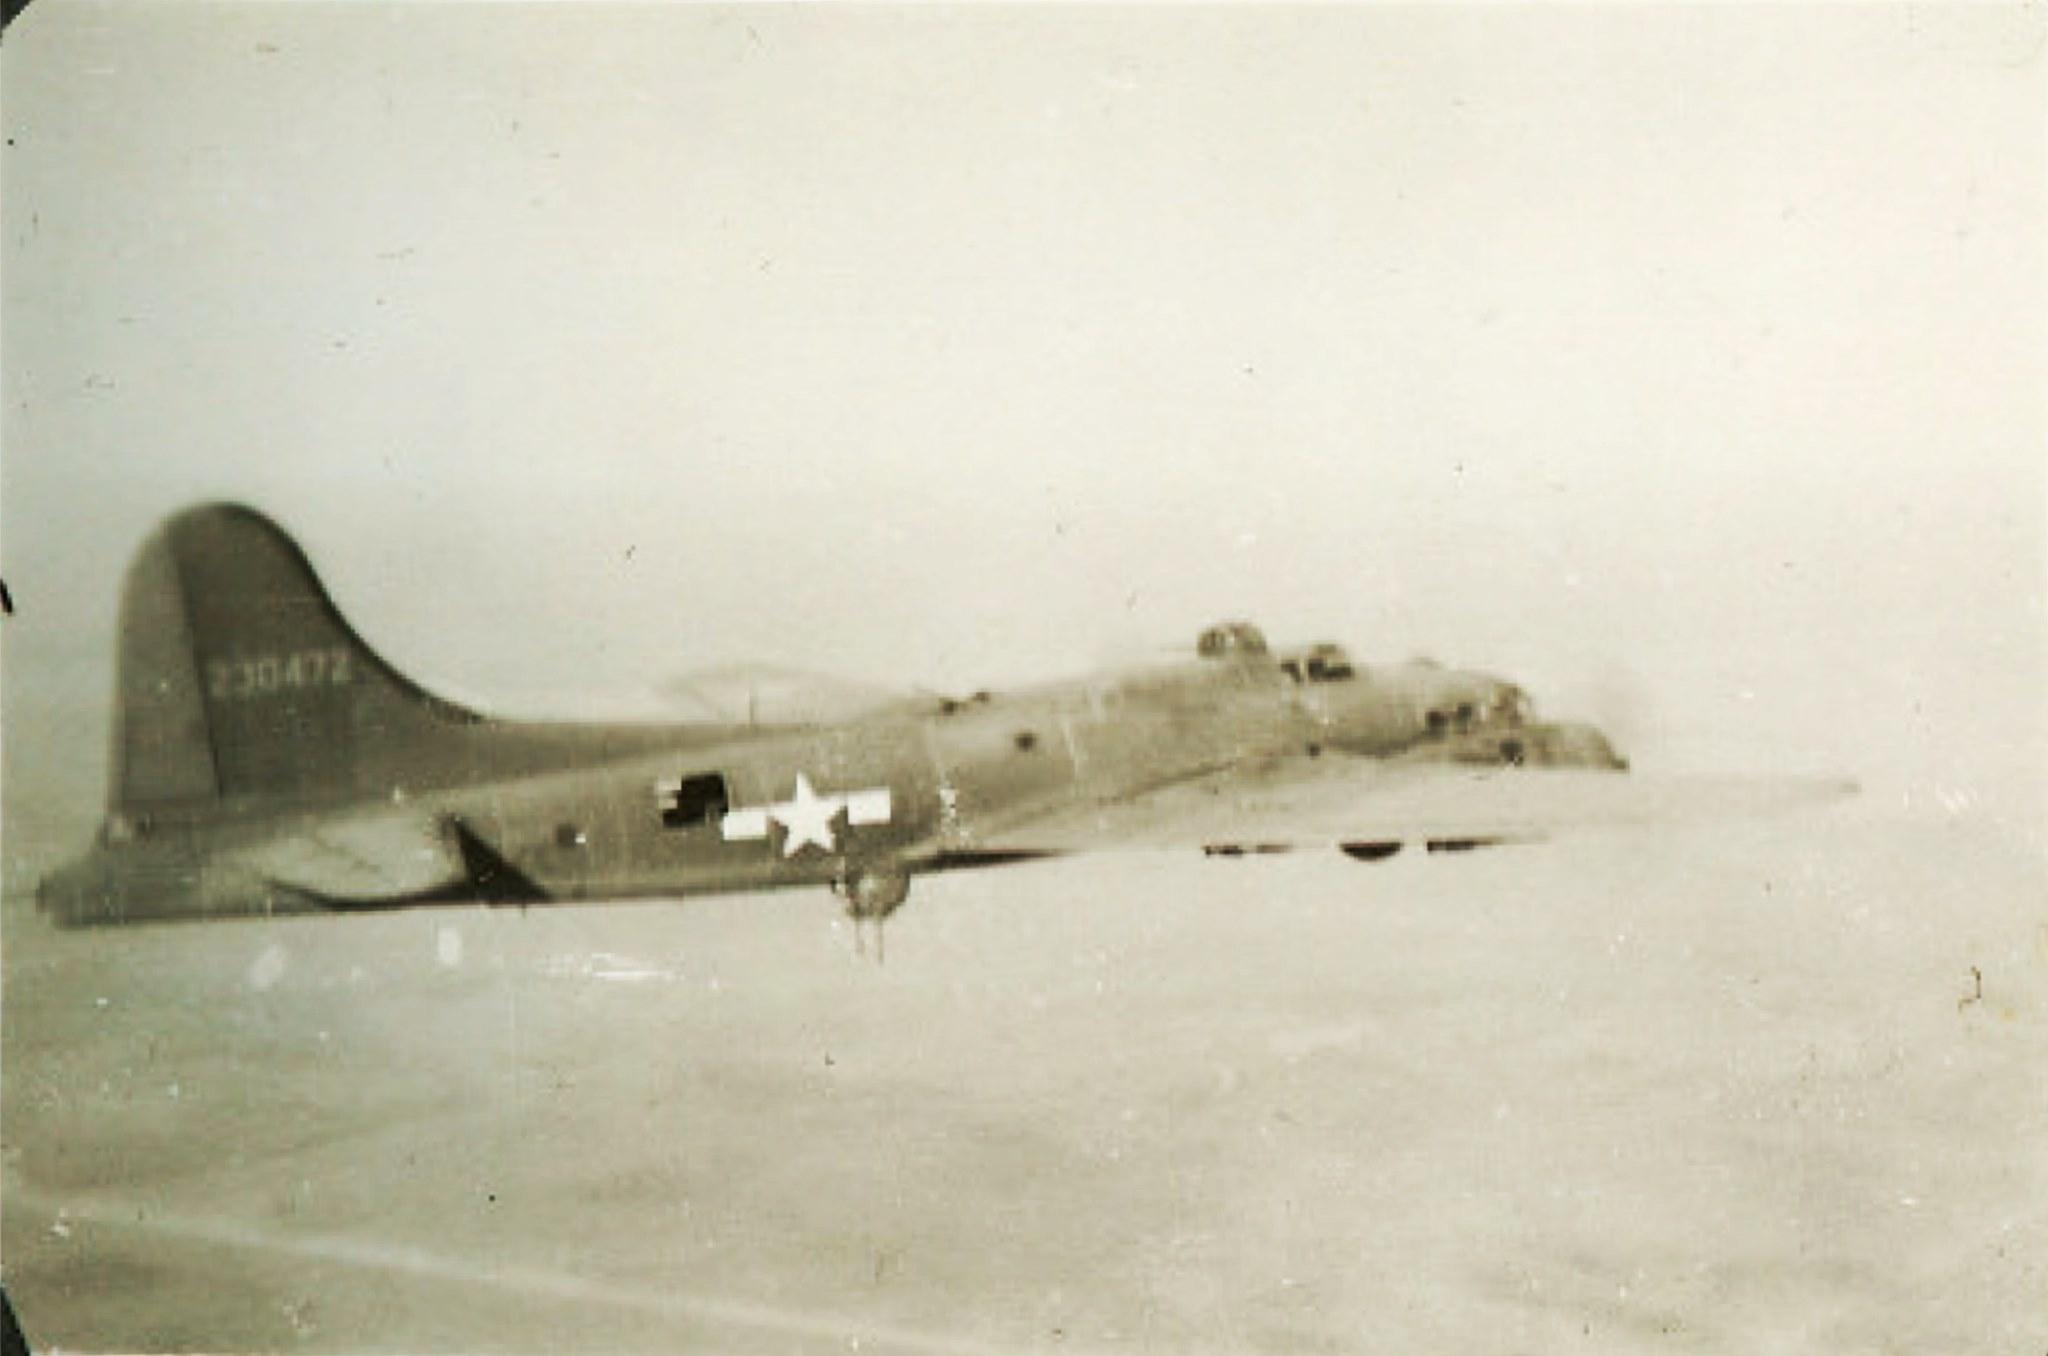 B-17 #42-30472